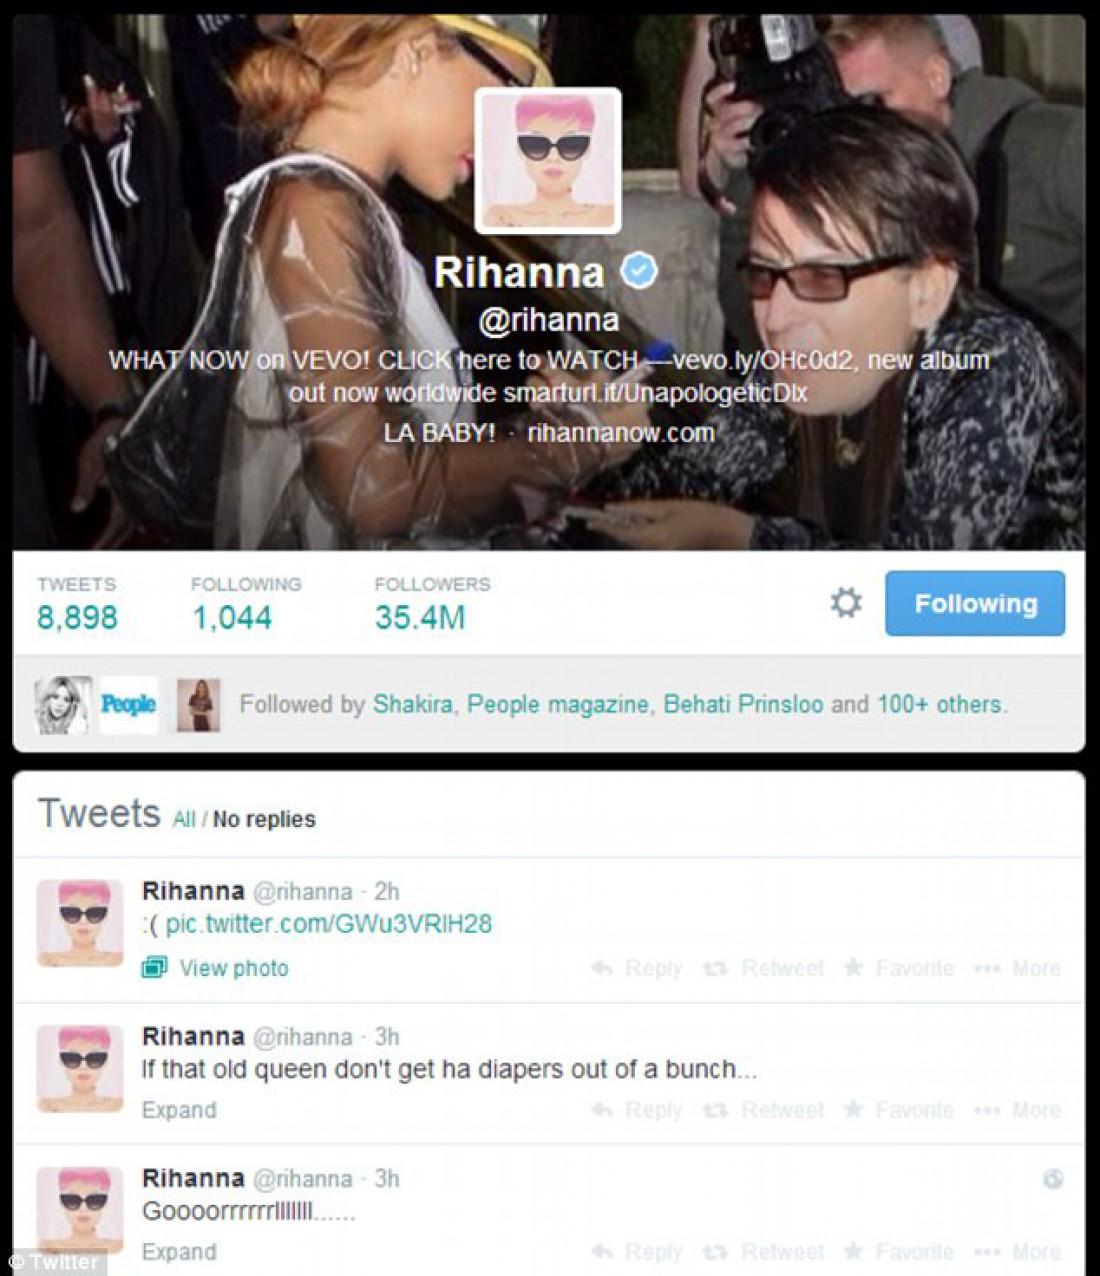 Пост в Twitter Рианны